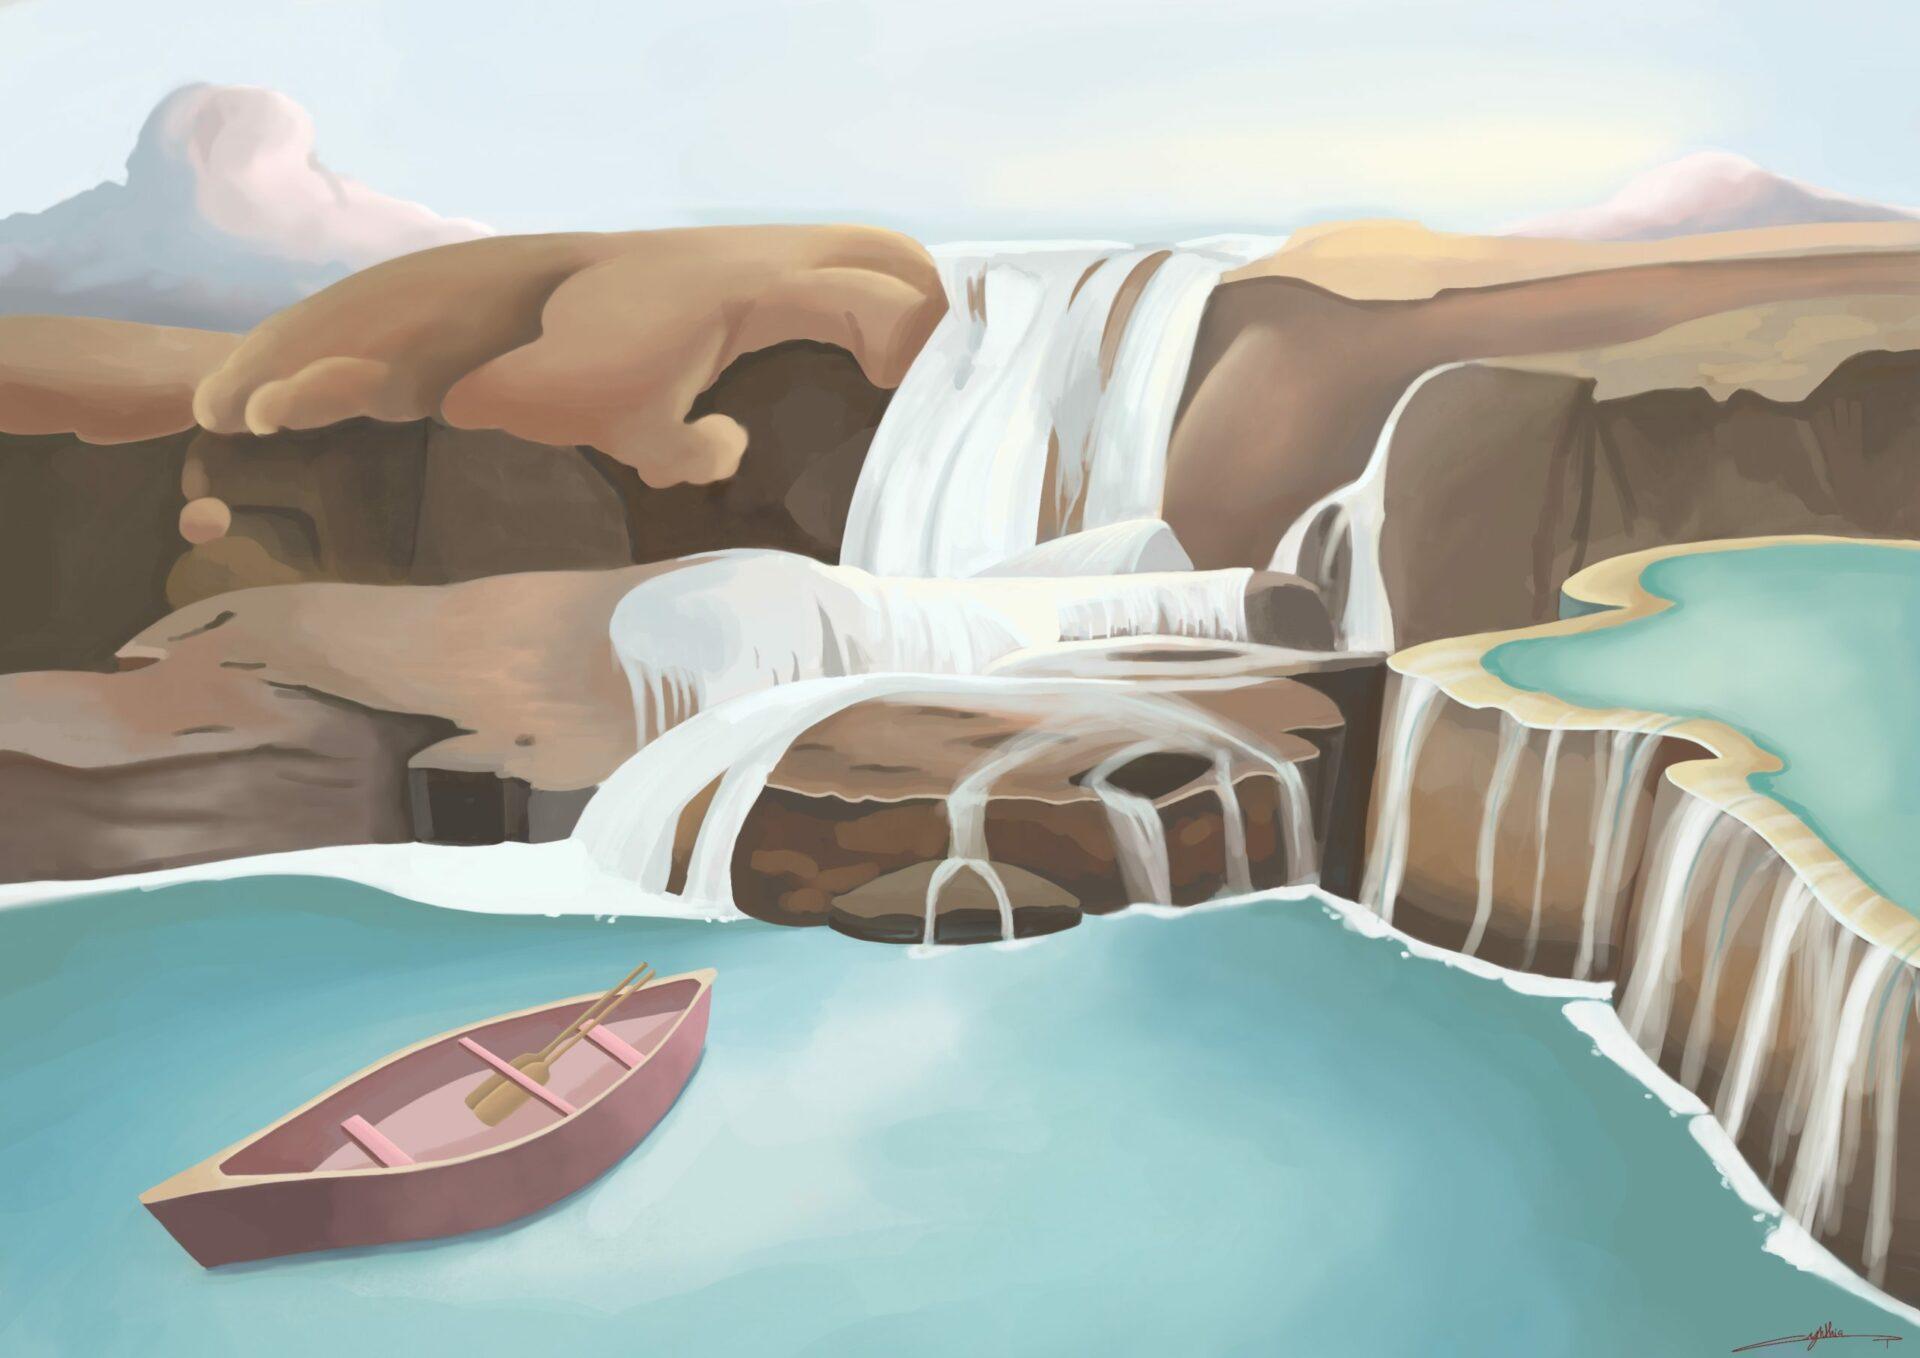 Paysage illustration de Cynthia Artstudio